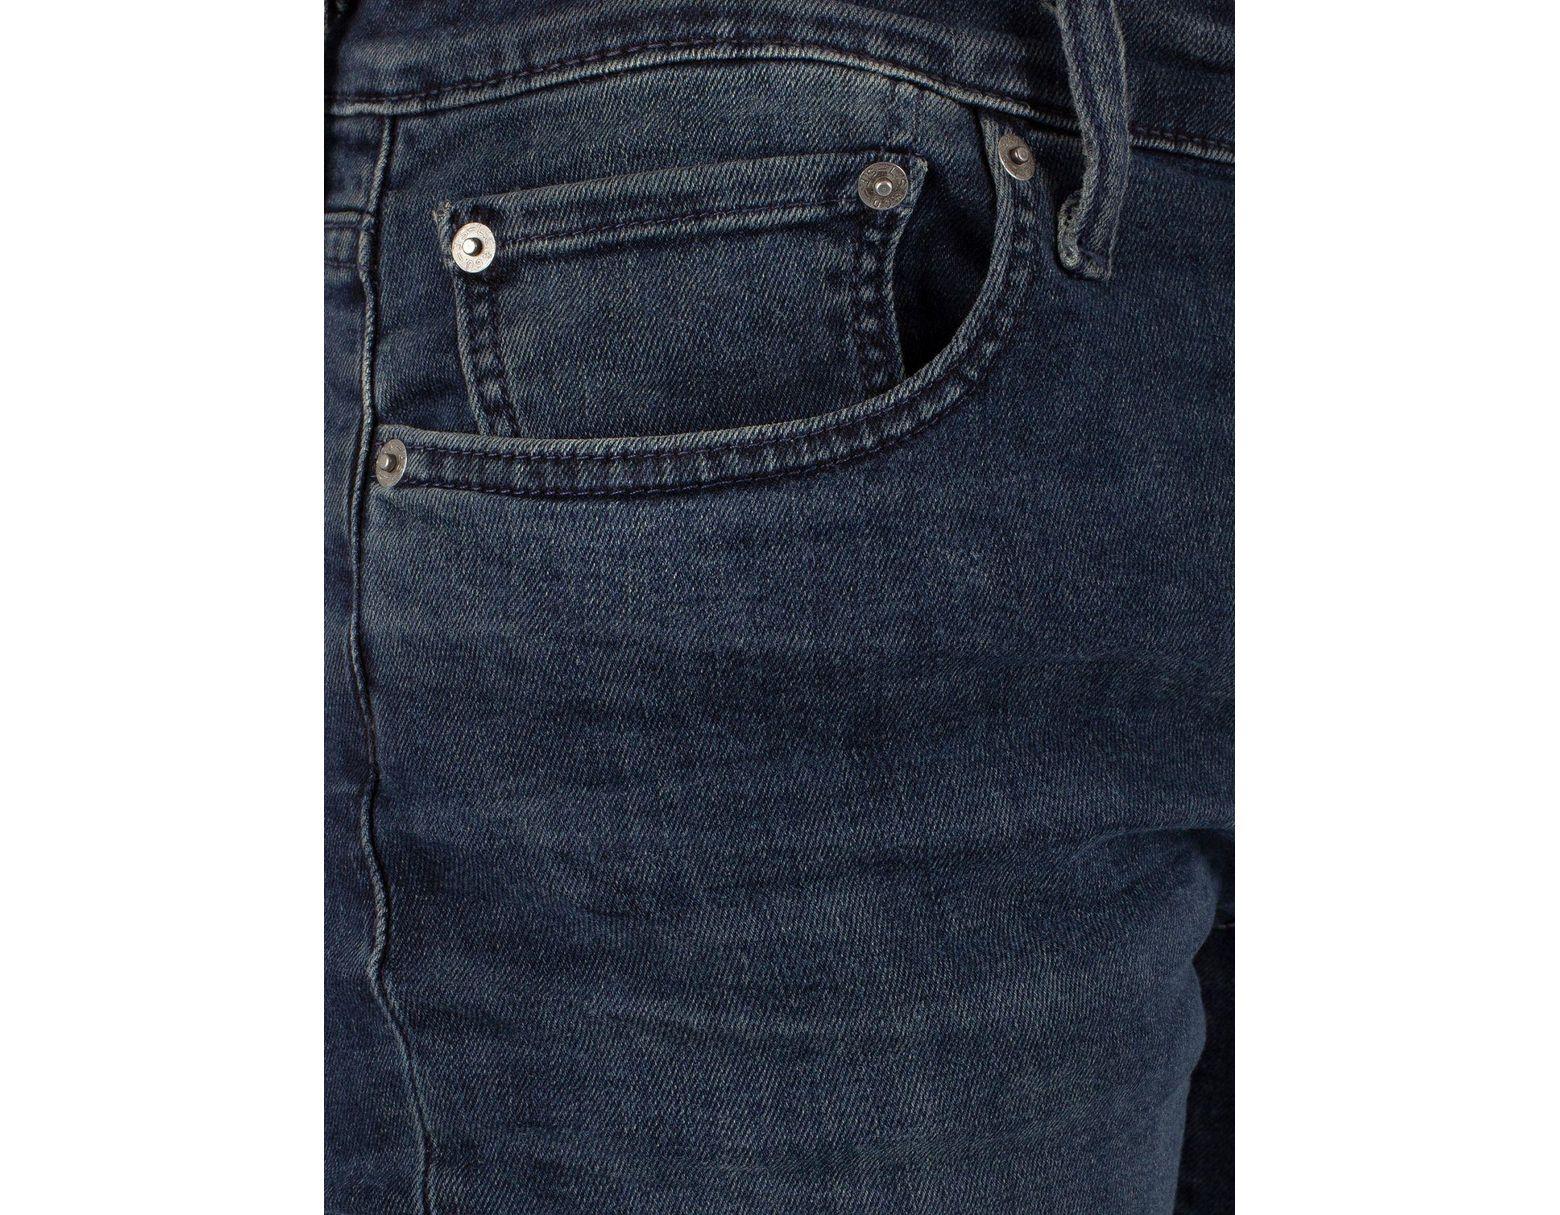 321b5308 Levi's Headed South 512 Slim Taper Jeans in Blue for Men - Lyst